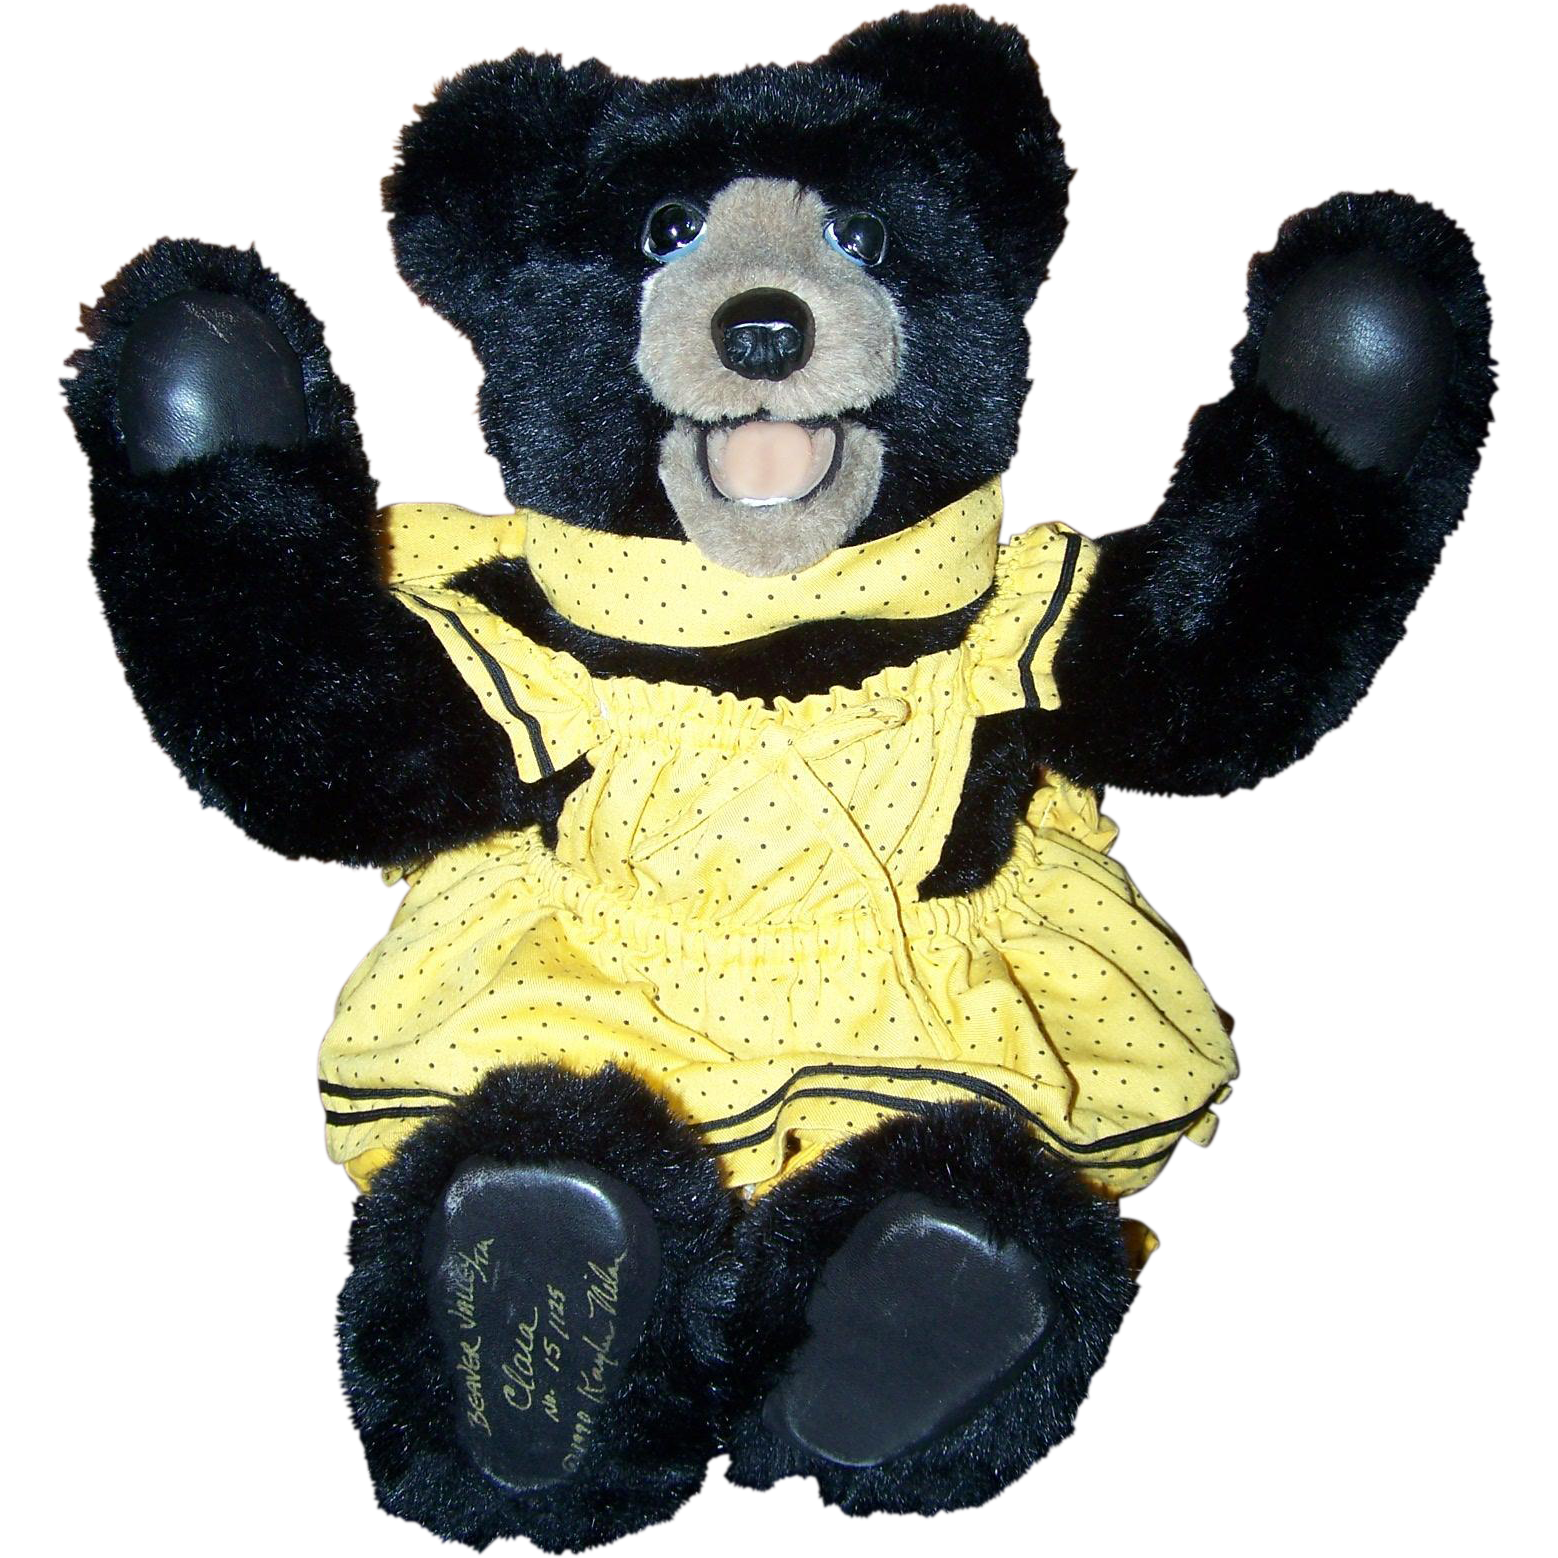 Artist Signed Beaver Valley Teddy Bear Clara No.15 / 125 1990 Kaylee Nilan